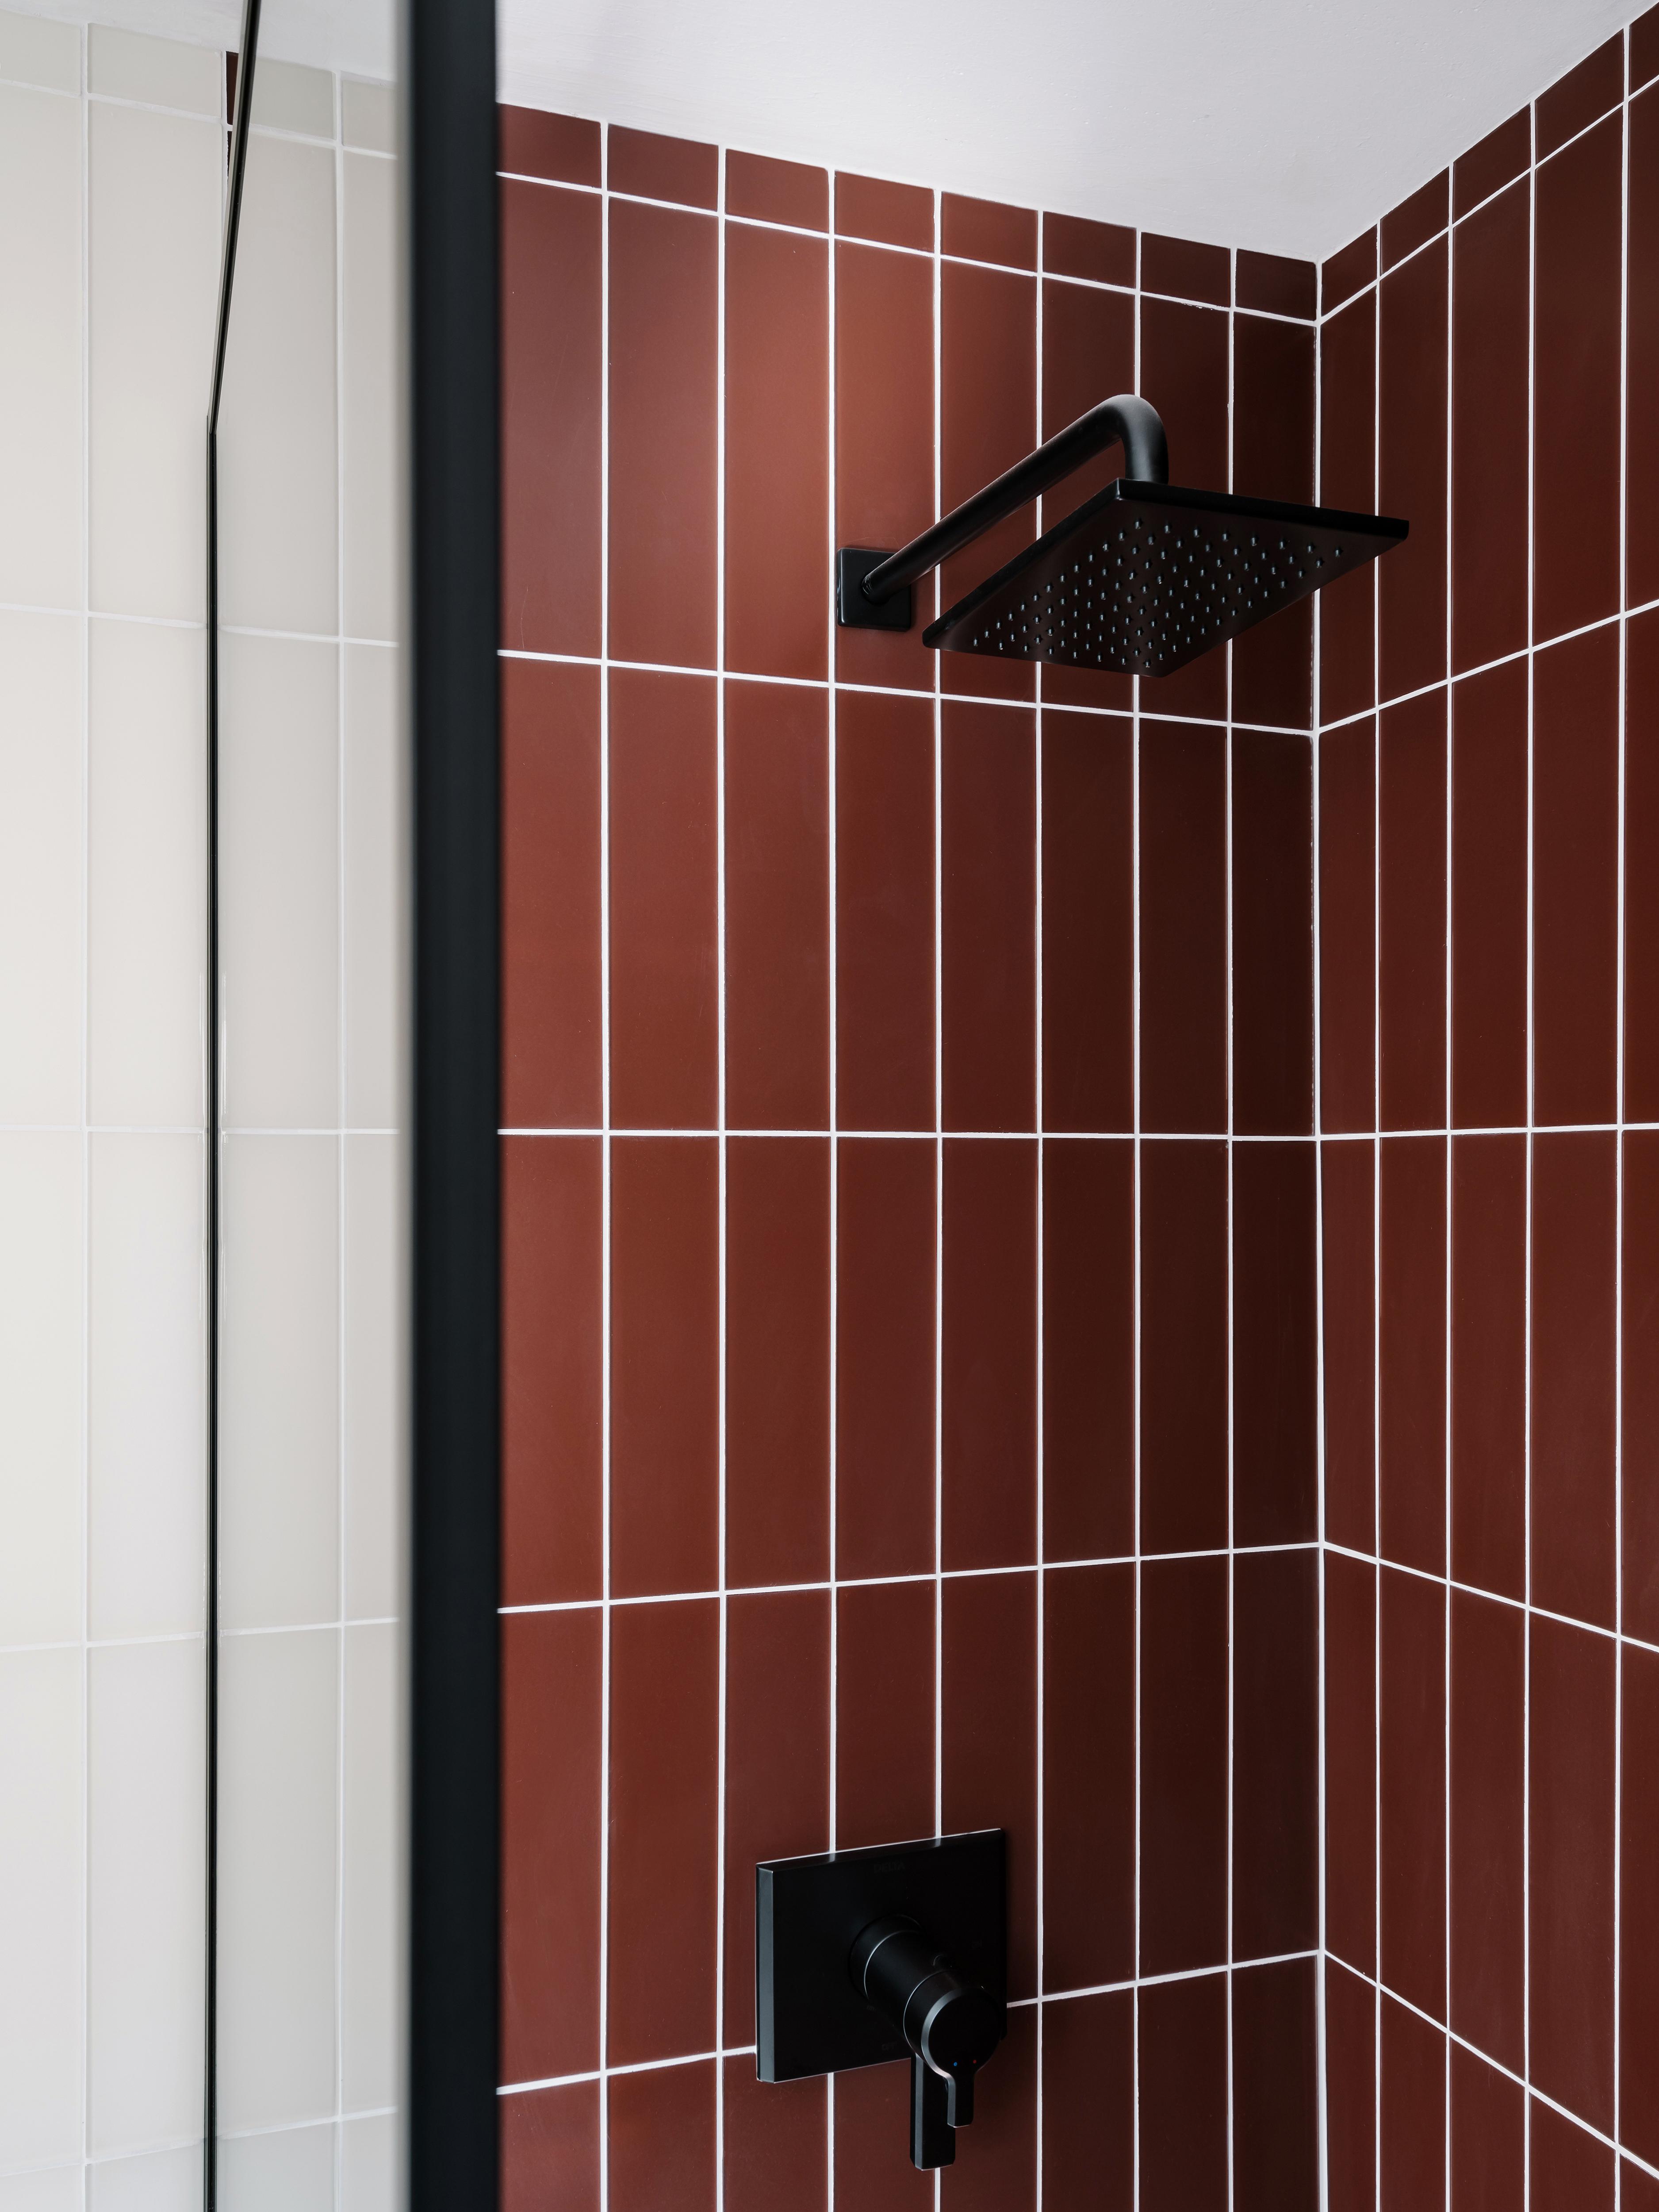 BLOG-2019_Q2_image_residential_full-rights_influencer_design_photo_chase-daniel_bathroom_shower_walls_glass_pheasant-matte_sparrow-matte_3x12_floor_tile_3x12_halite_vertical_straight-set_fixture_detail_FC-263094_FC-263091.jpg?mtime=20190508154928#asset:451623